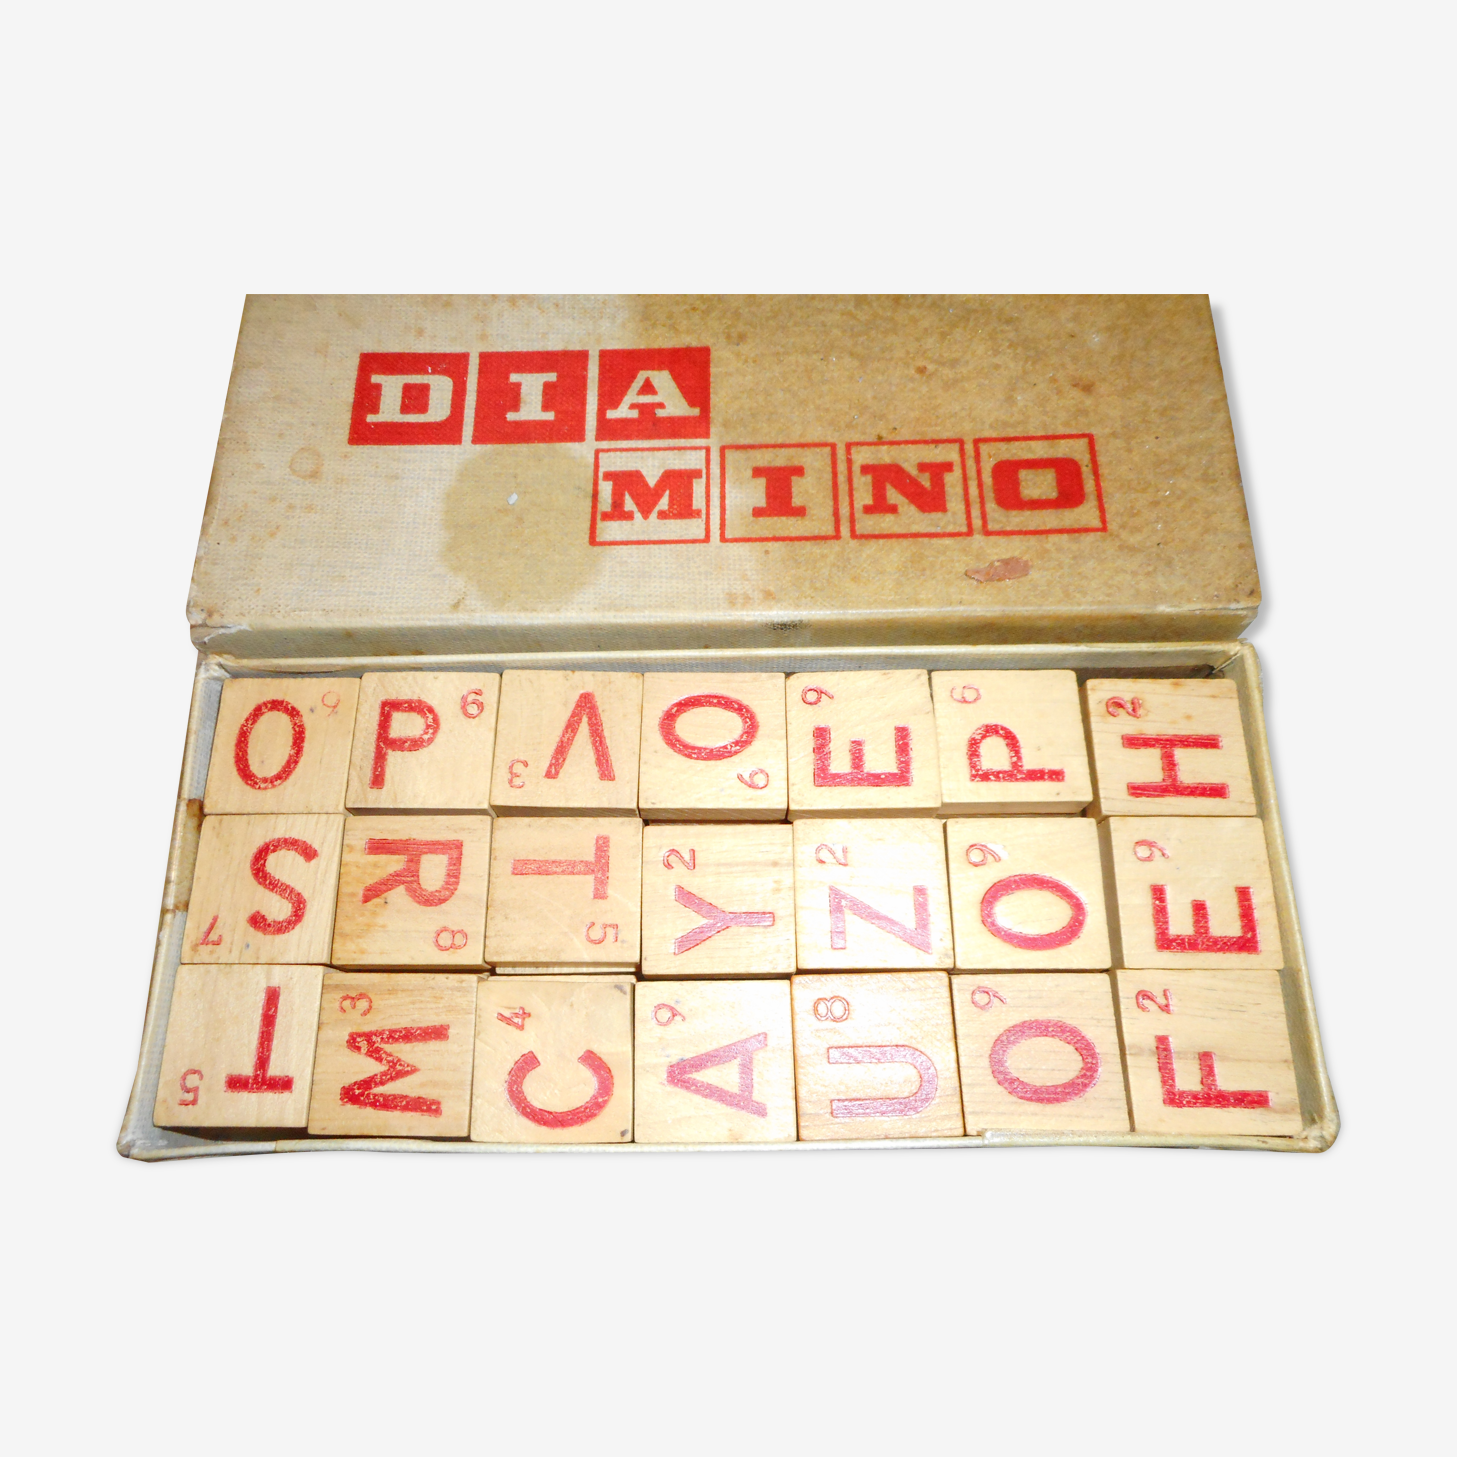 Diamino in his cardboard box